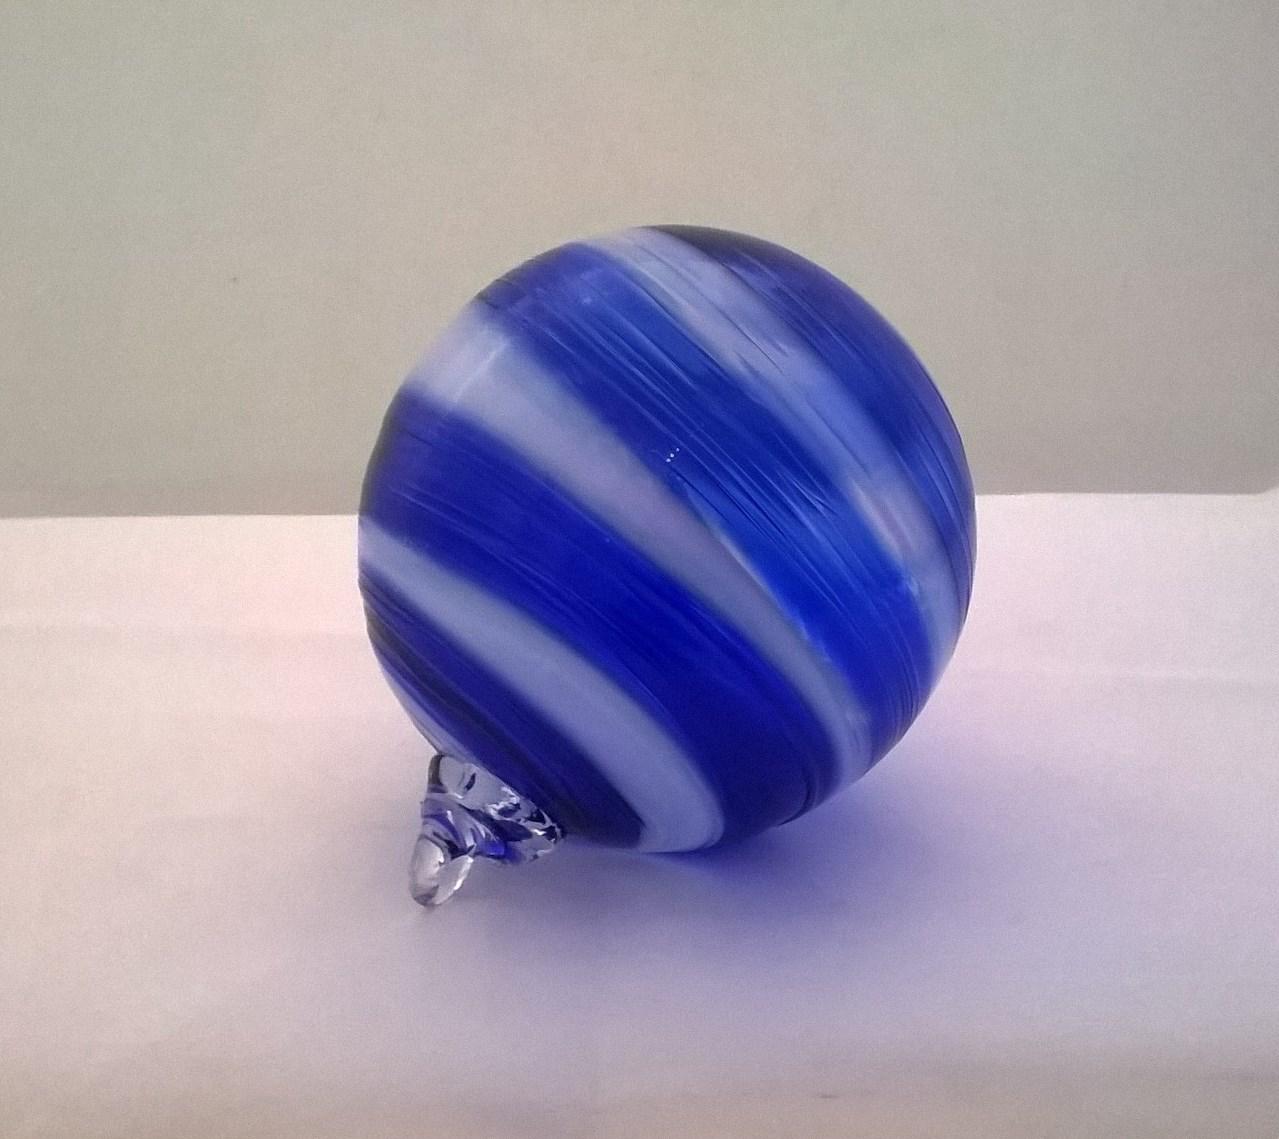 cobalt and white twist